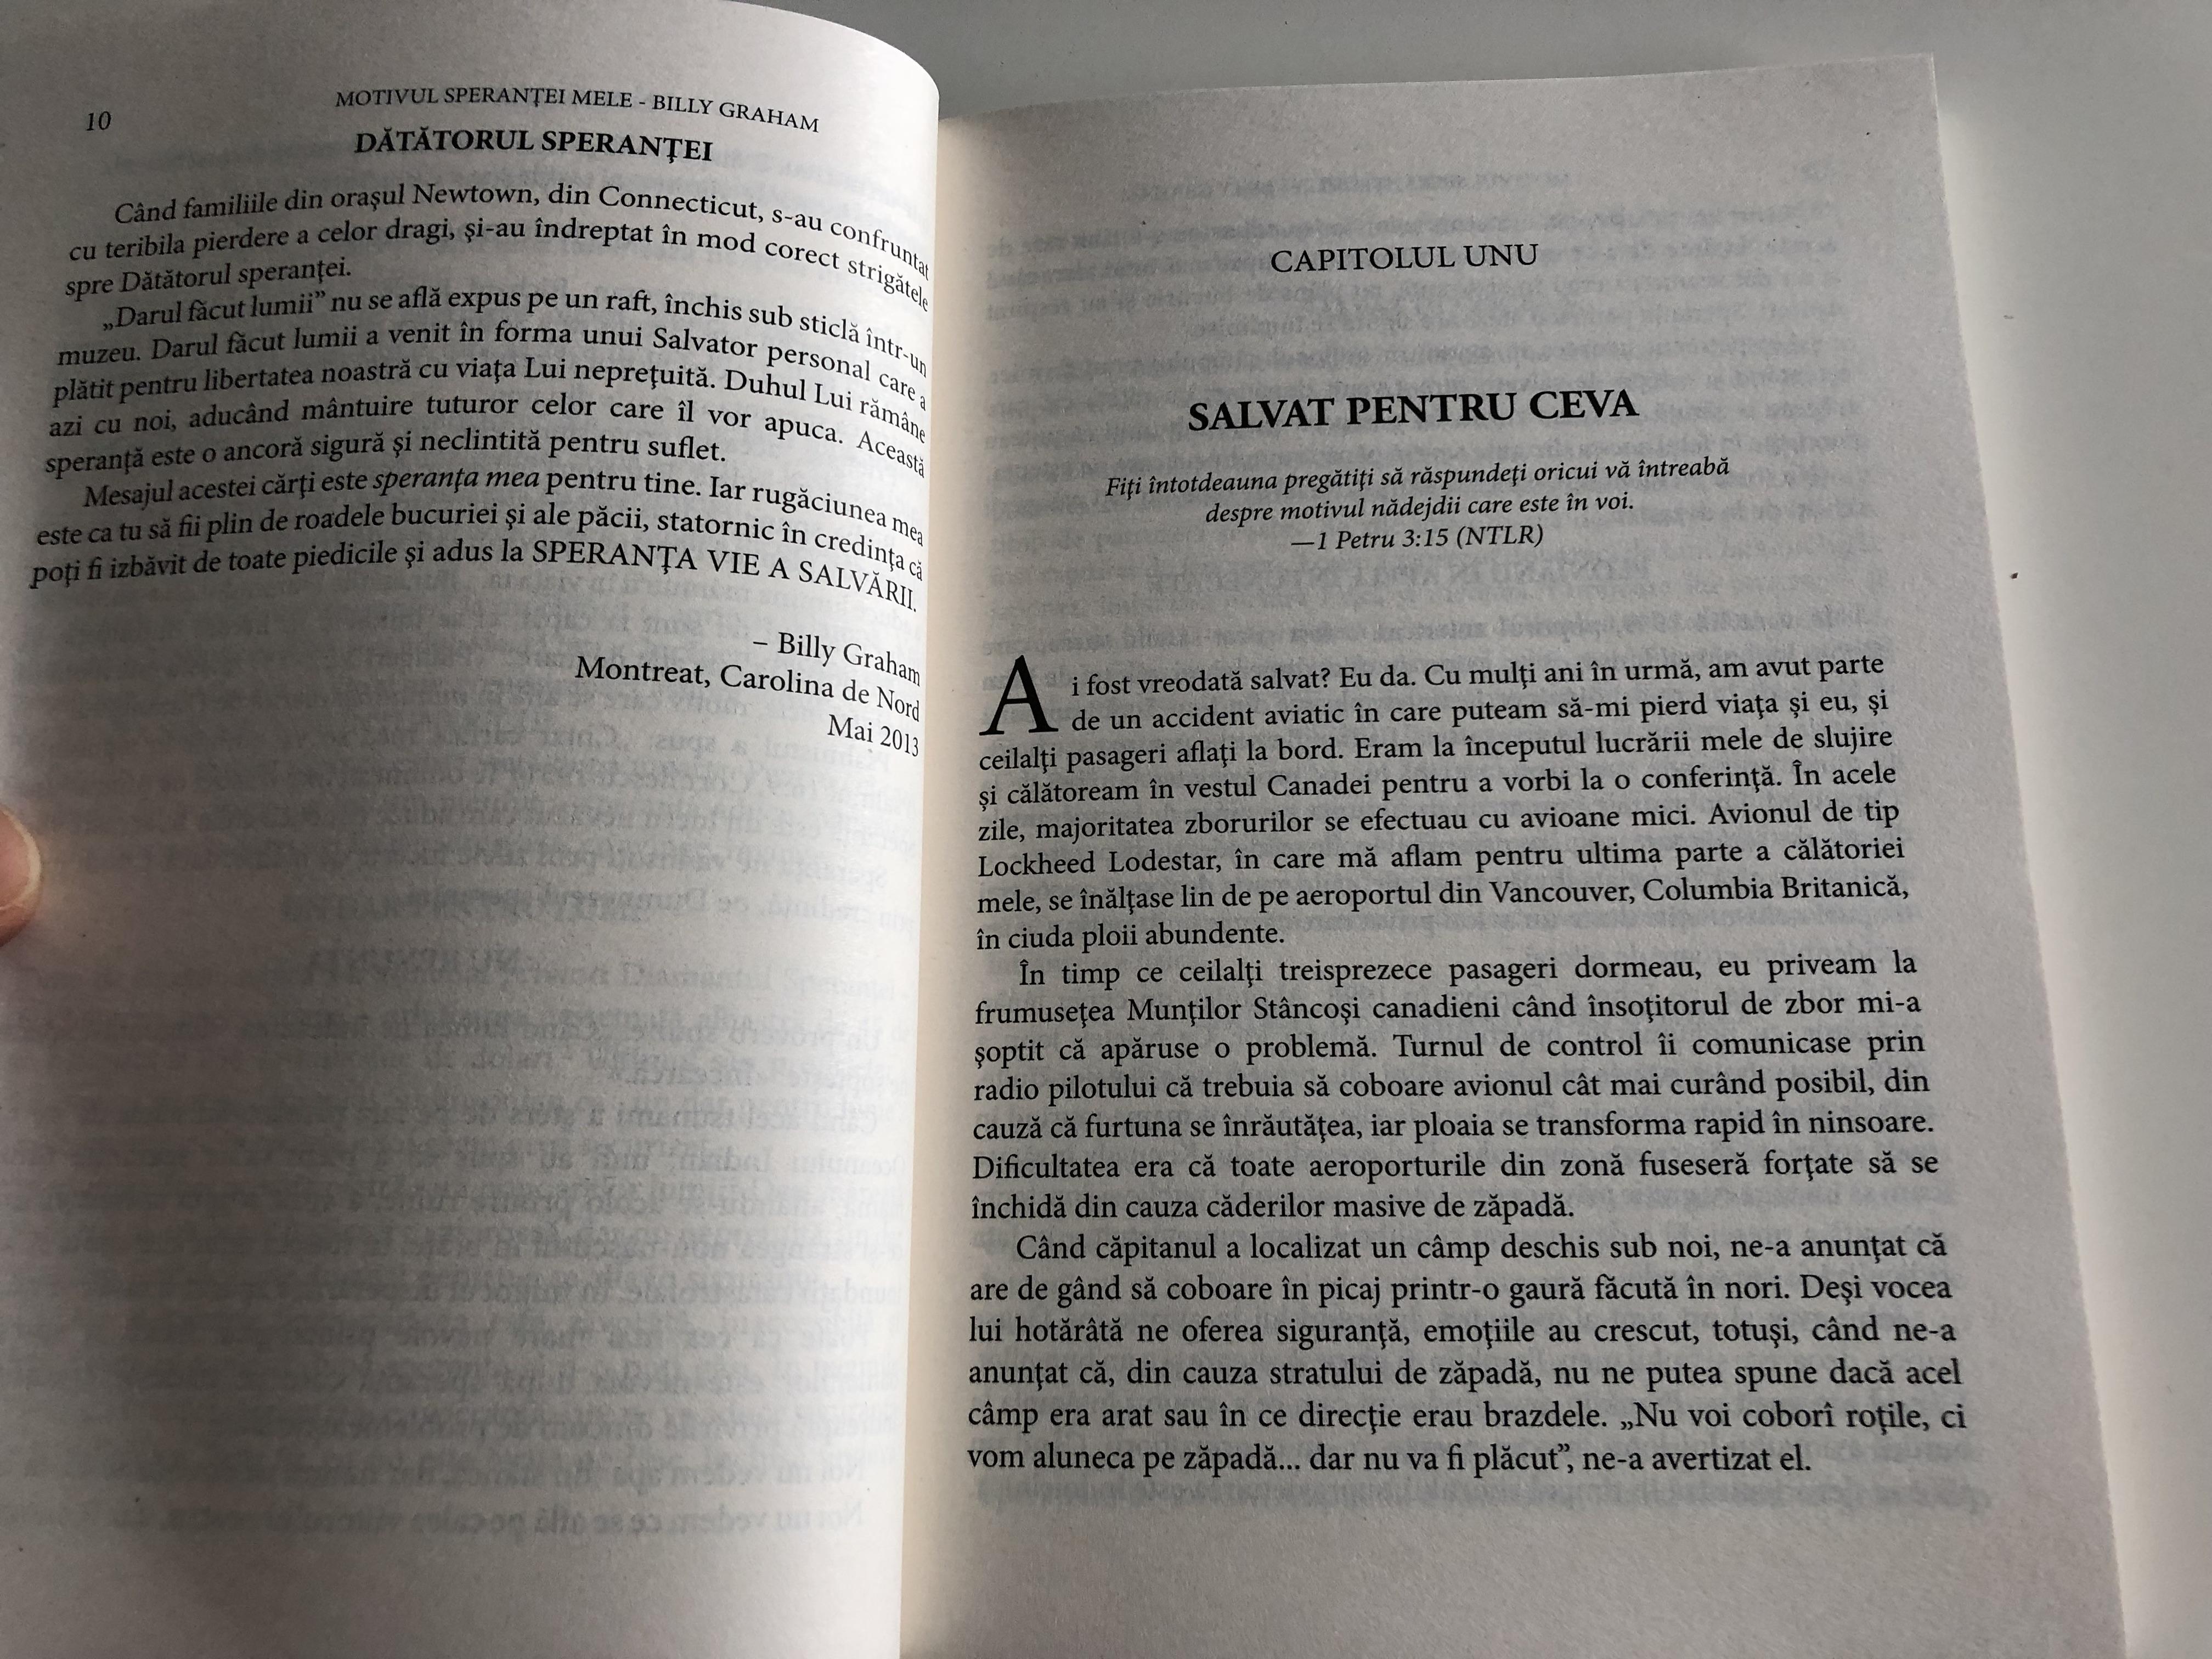 motivul-sperantei-mele-salvarea-by-billy-graham-romanian-translation-of-the-reason-for-my-hope-salvation-paperback-2014-clc-romania-6-.jpg